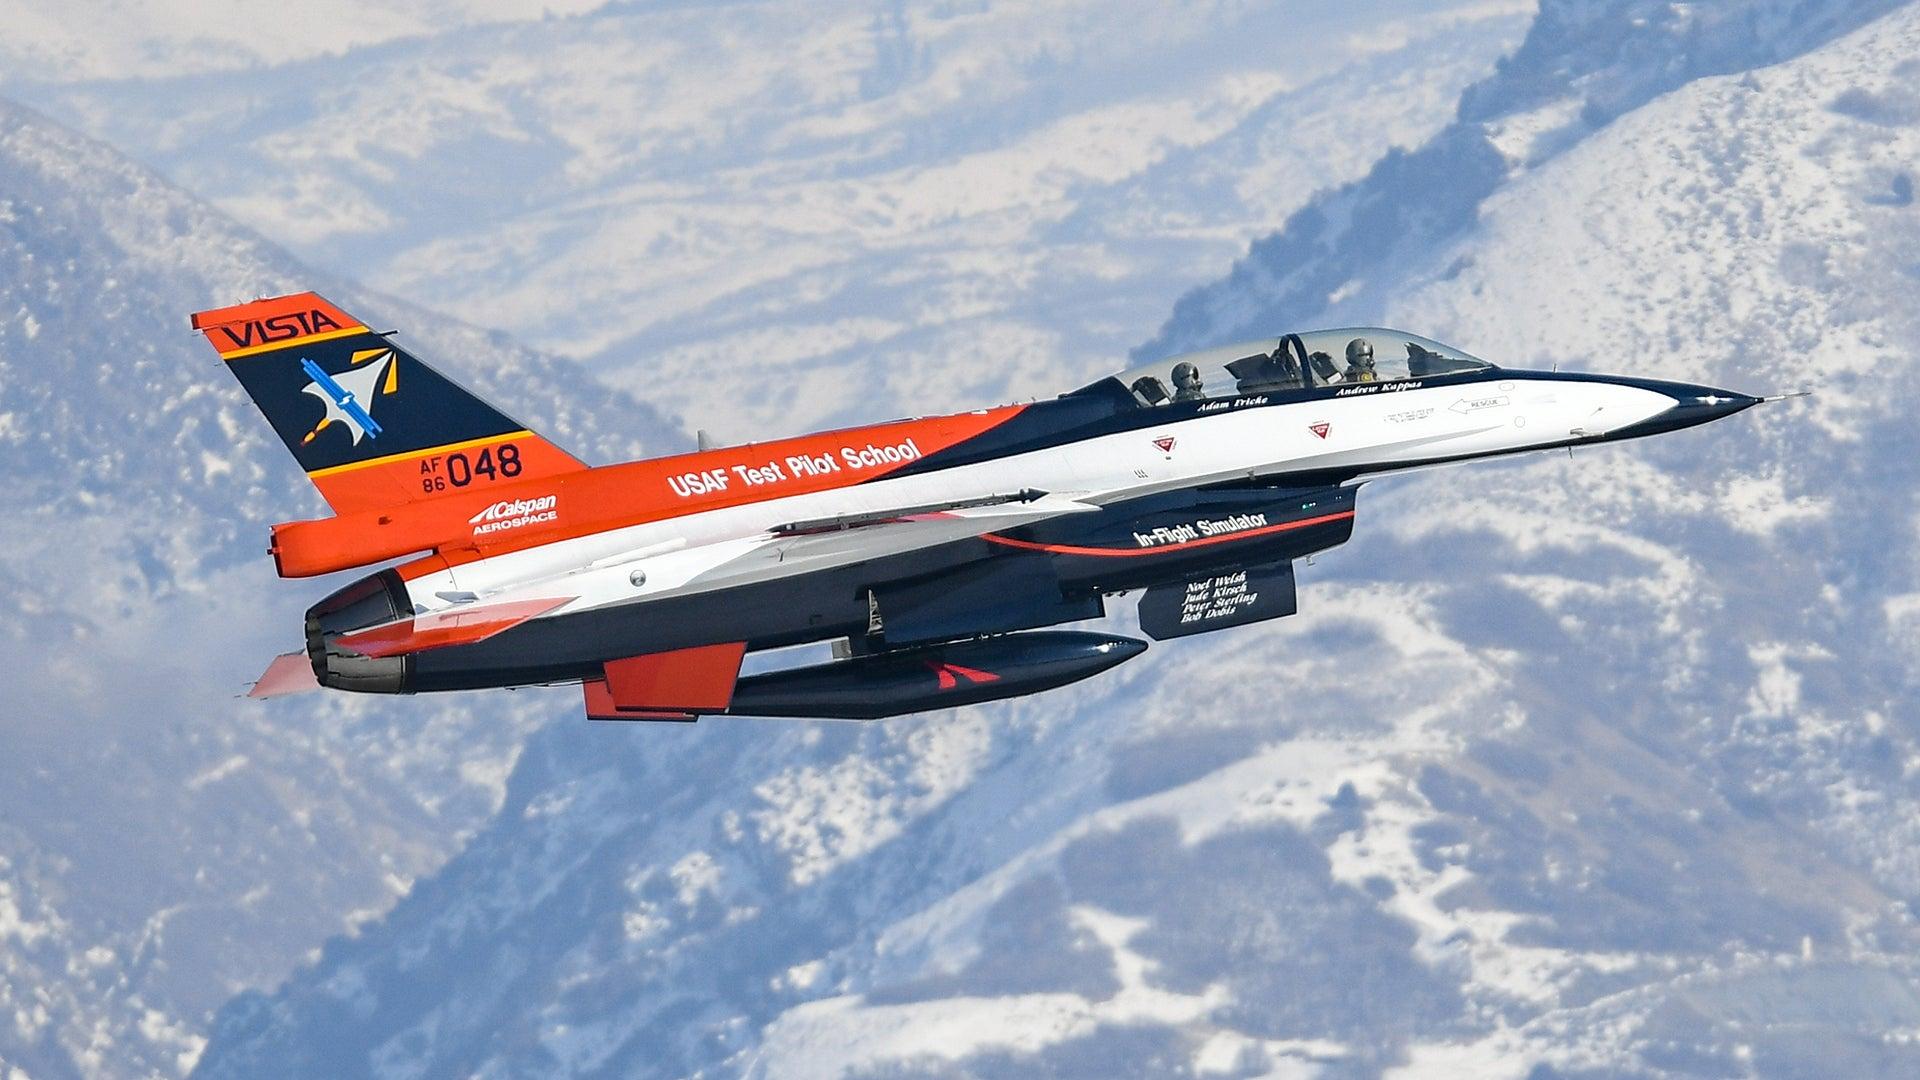 F-16-VISA.jpg